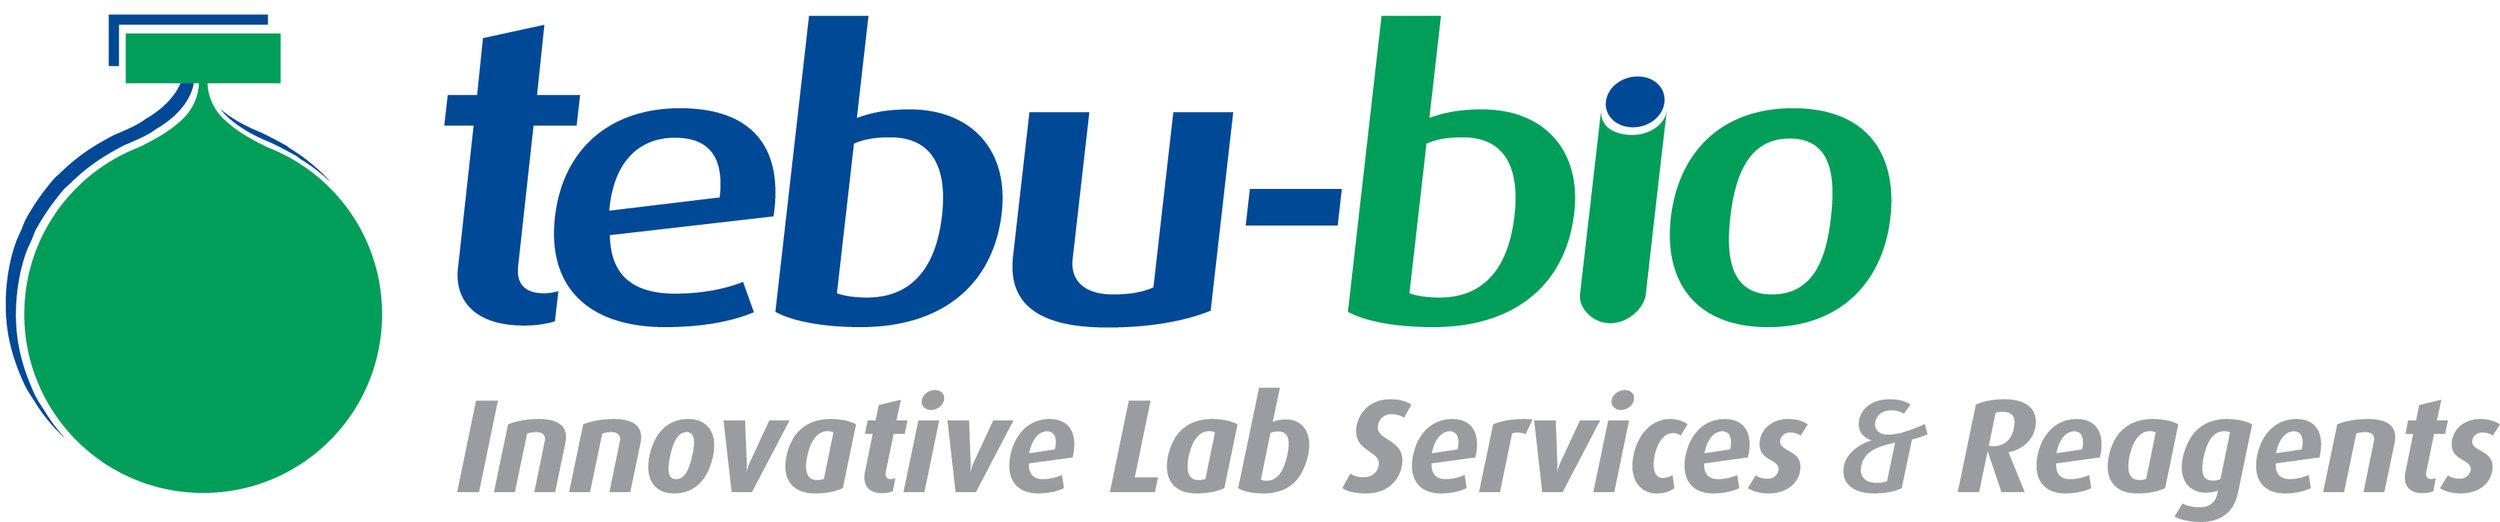 tebu-bio Nordic Countries - CAT Science ParkUniversitetsparken 74000 RoskildeDenmarkTel: +45 46 74 02 54Fax: +45 46 74 02 53Website: www.tebu-bio.com